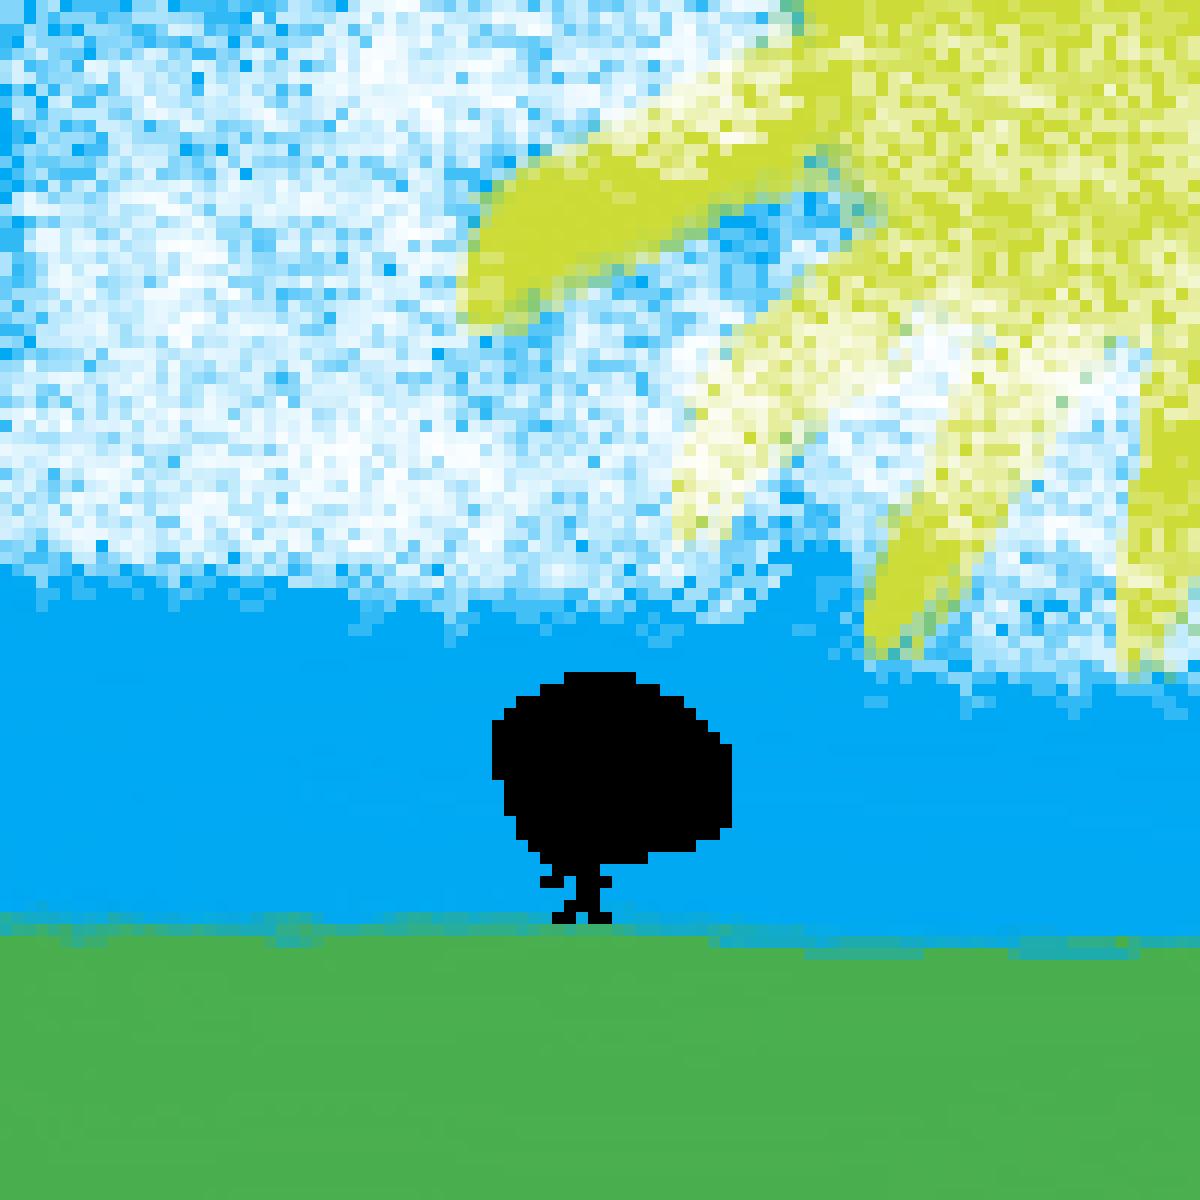 sunn by bobthebulider